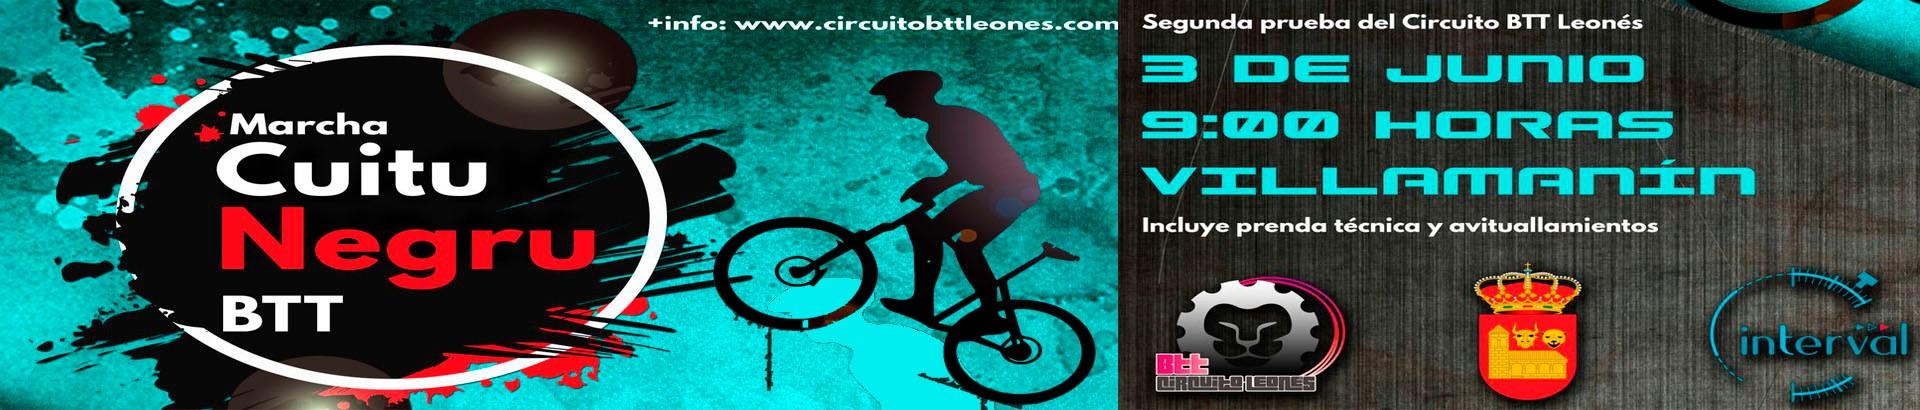 Circuito Leones Btt : I btt robles milenarios registrations info u sportmaniacs